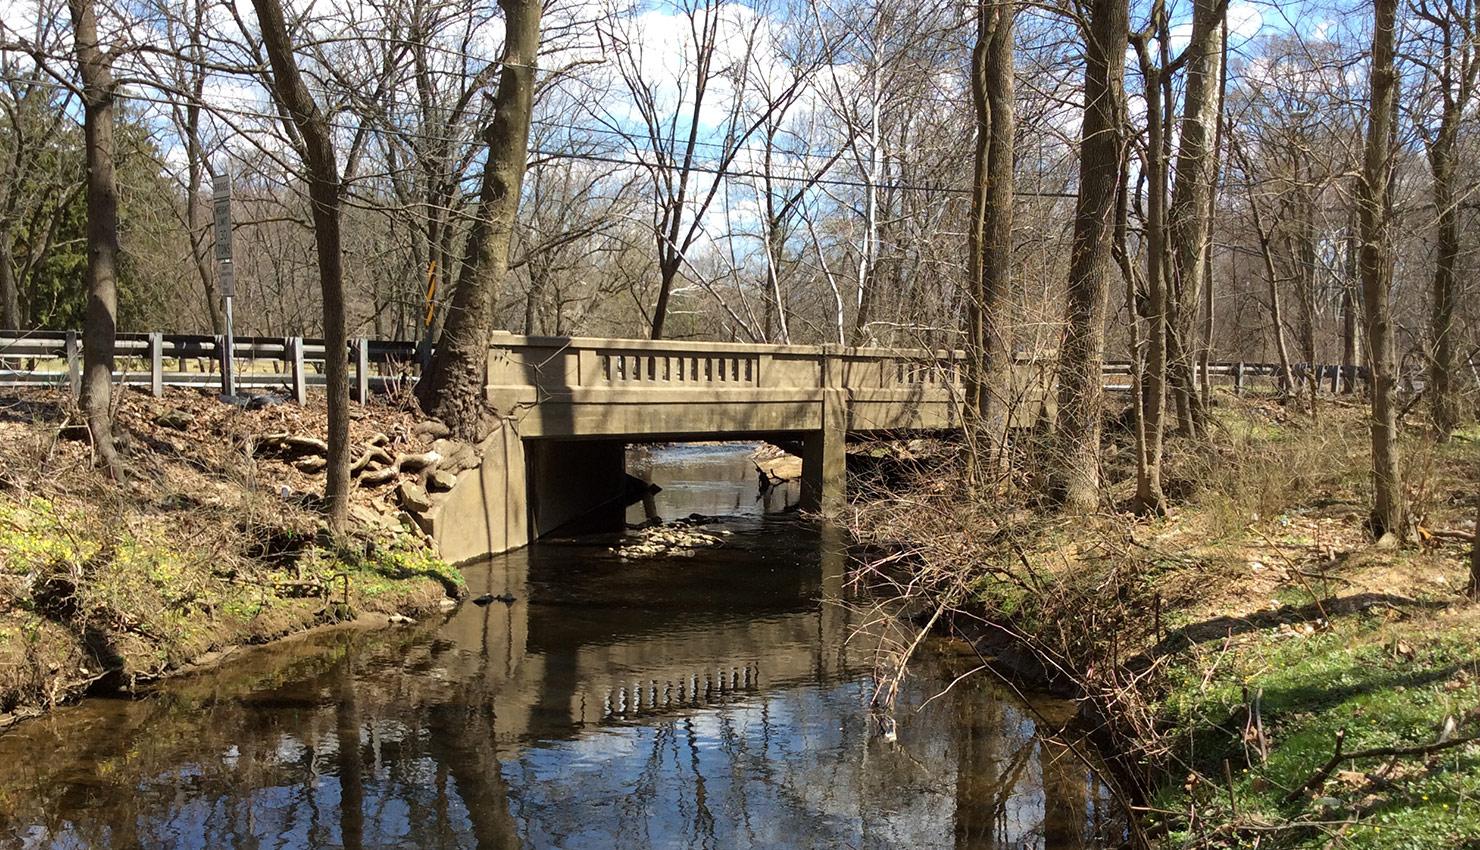 Construction to Begin on Pennsylvania Avenue Bridge in